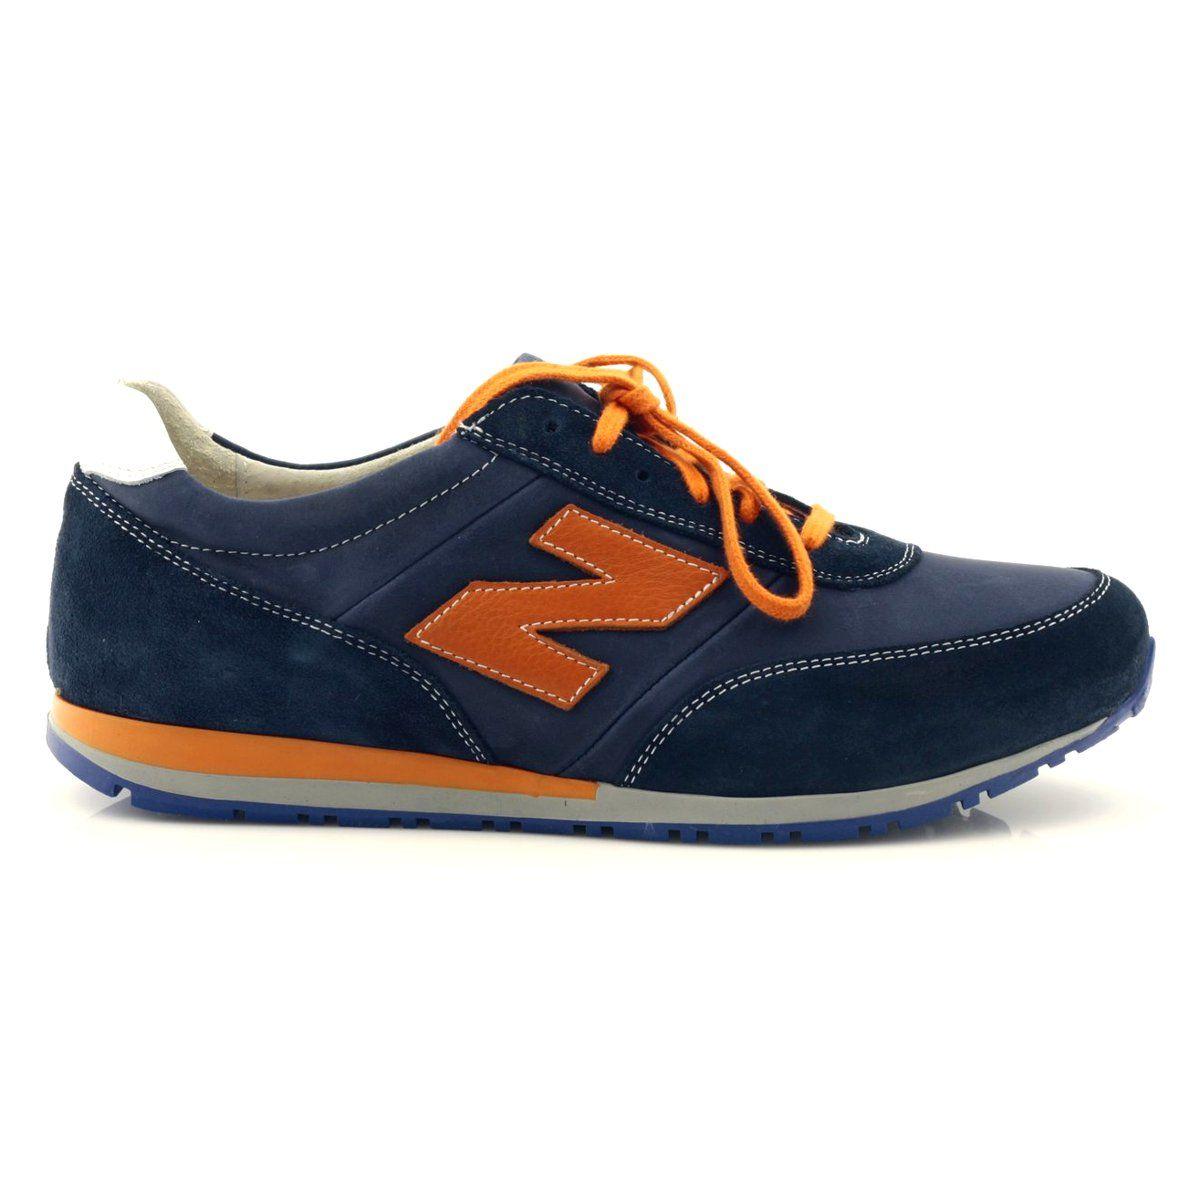 Riko Buty Meskie Sportowe Skorzane 723 Pomaranczowe Granatowe Shoes Mens Casual Shoes Shoes